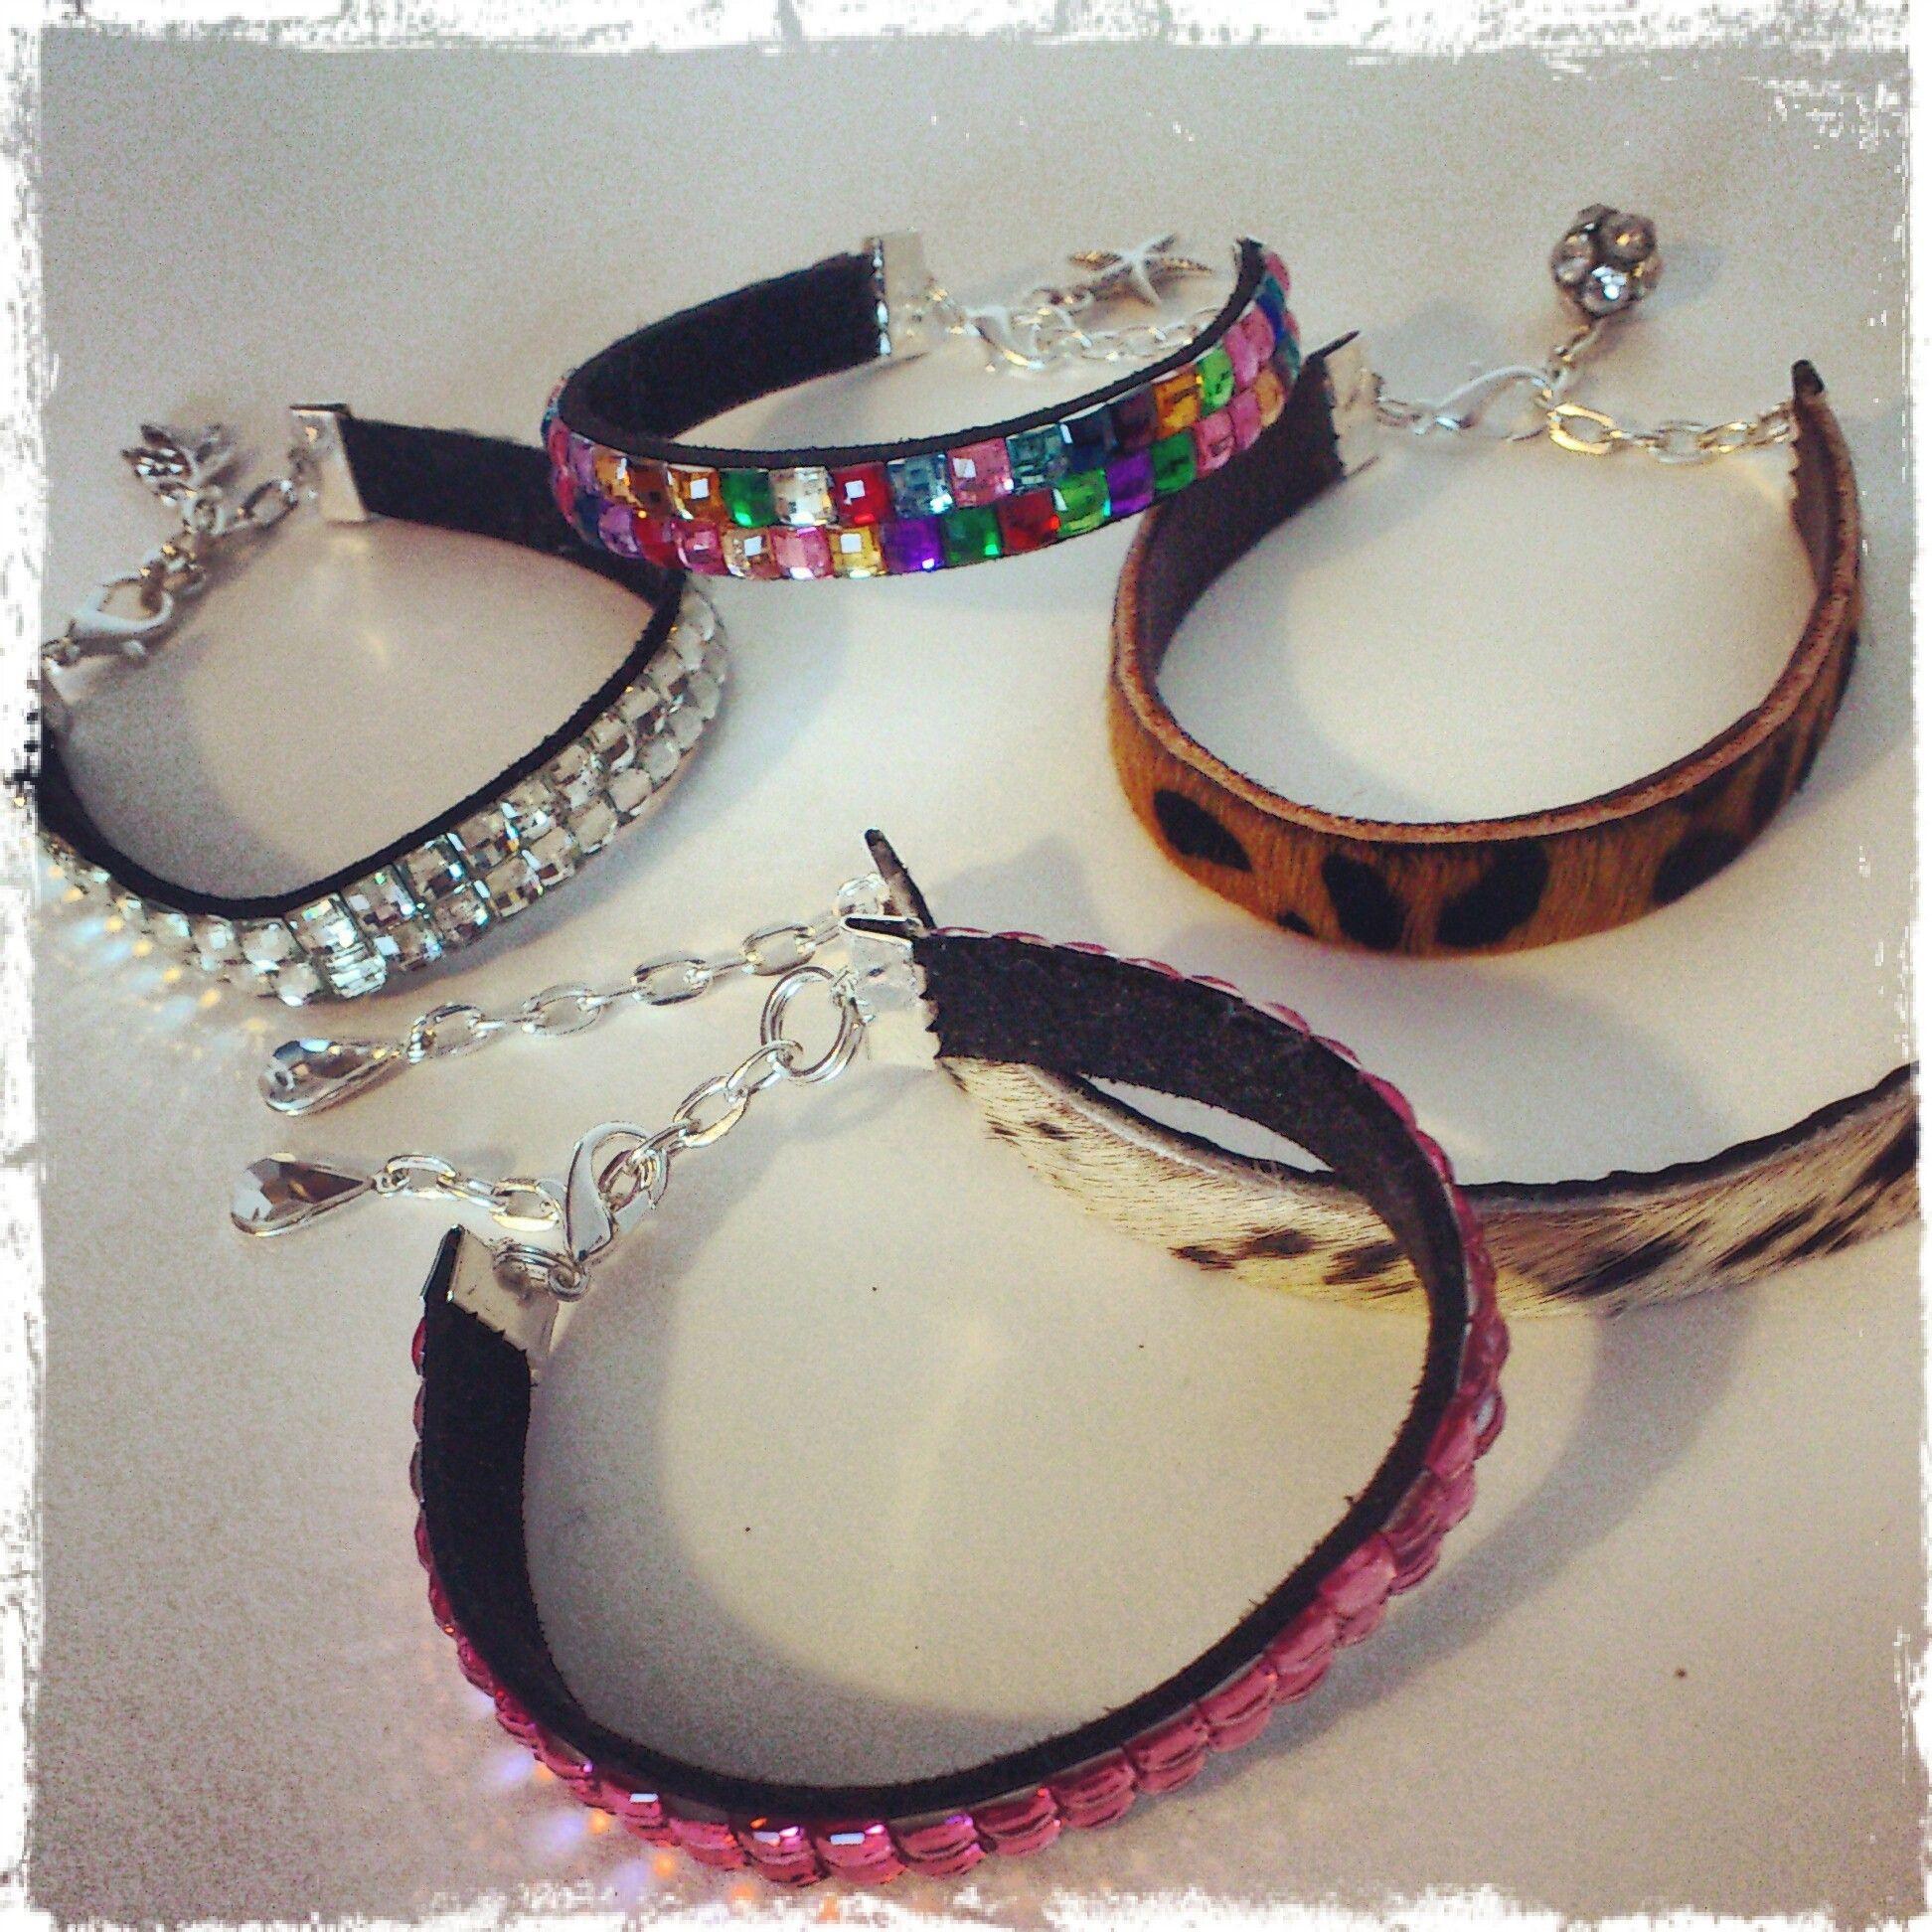 bracelet pulseras fashion bisuteria jewelry shine handmade shuuforyou leopard glitter style accessories accesorios